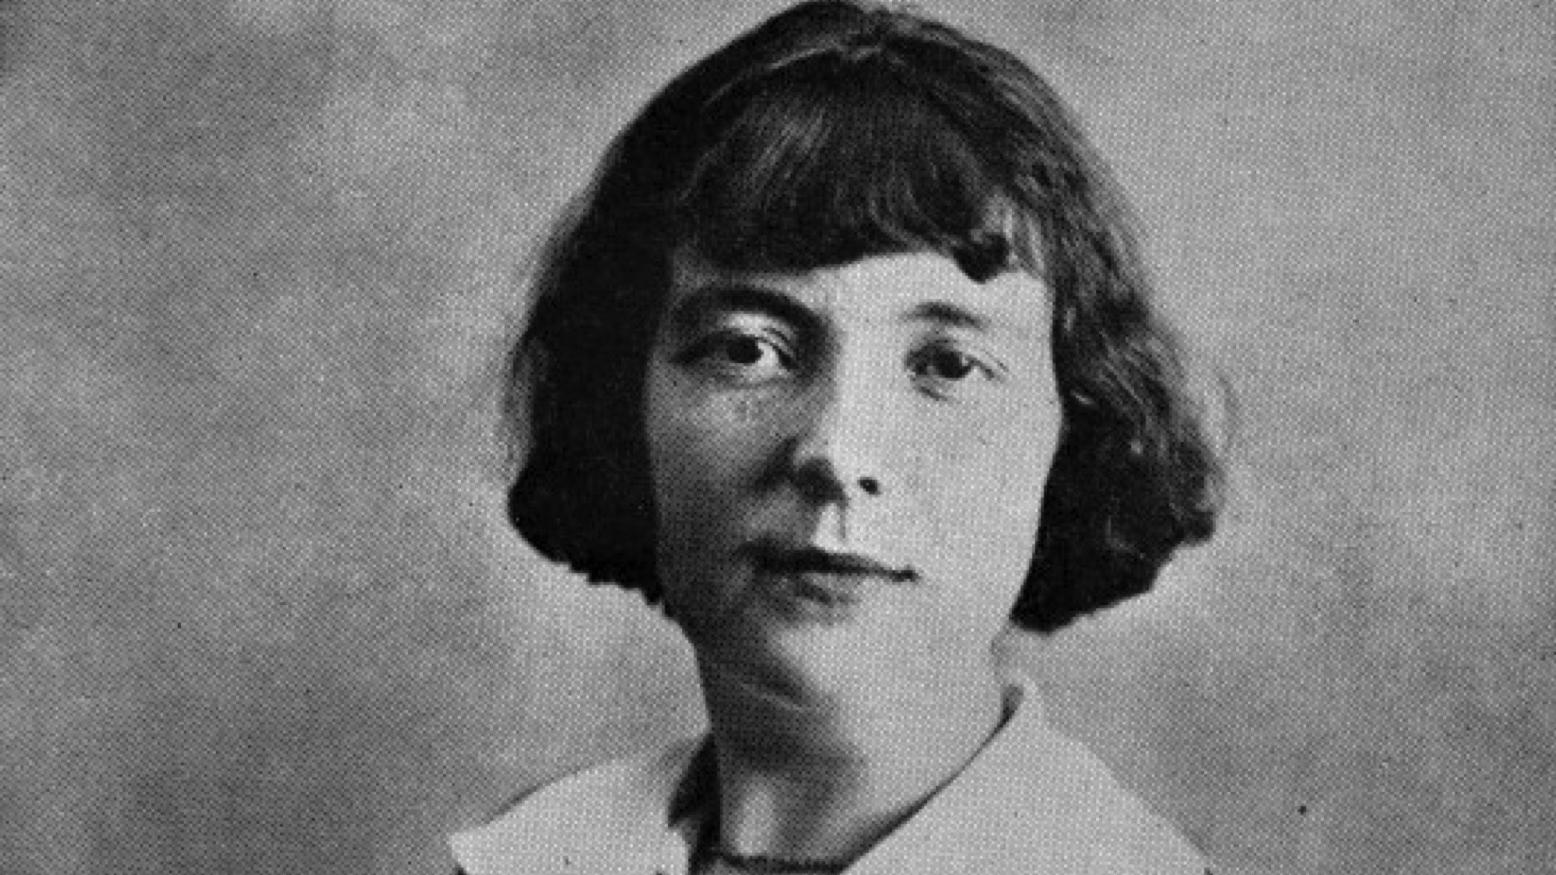 Cartas de Katherine Mansfield revelam preferência por Proust e Tchekhov e certo desprezo por Joyce